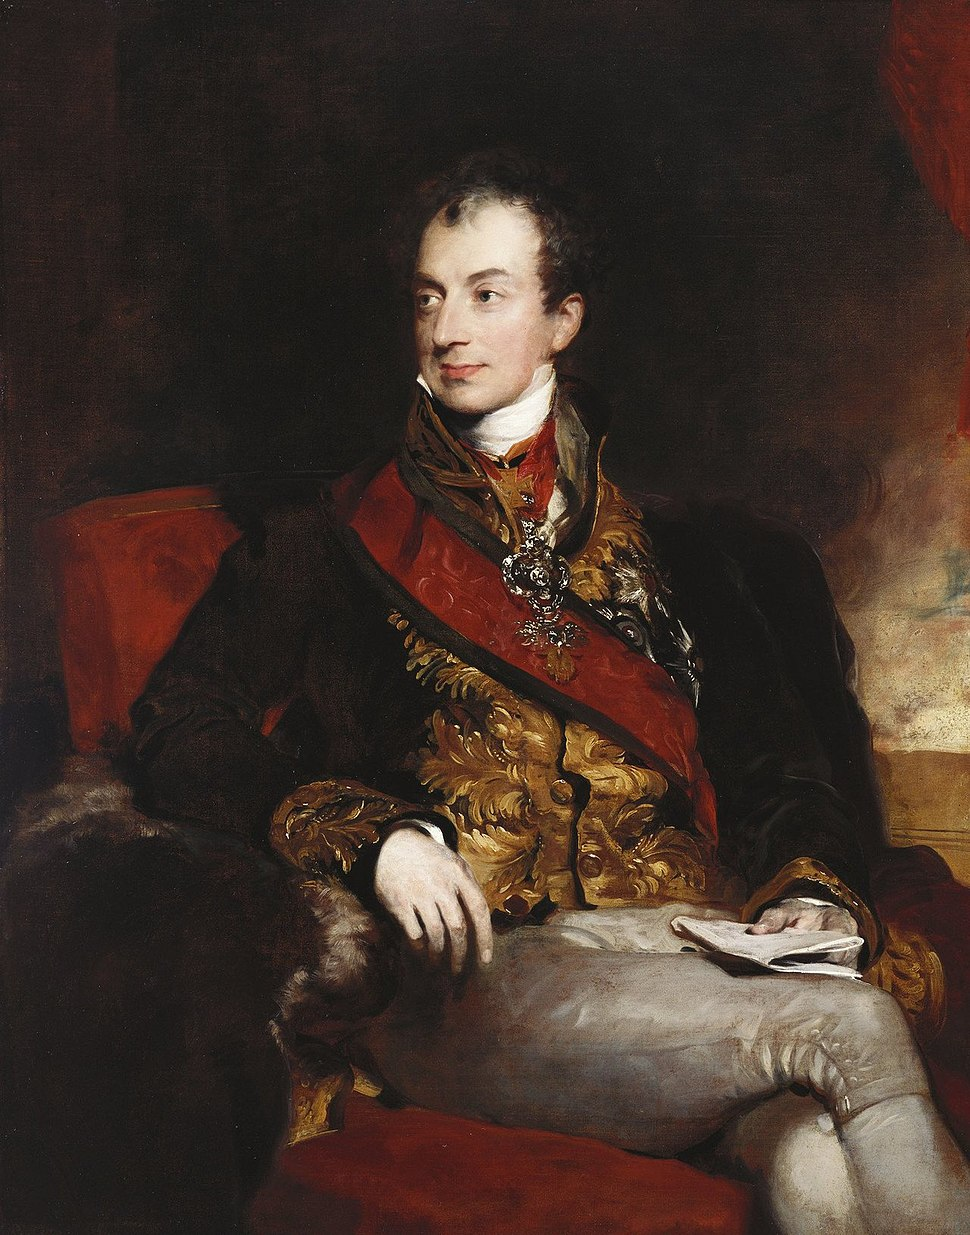 Klemens von Metternich by Lawrence